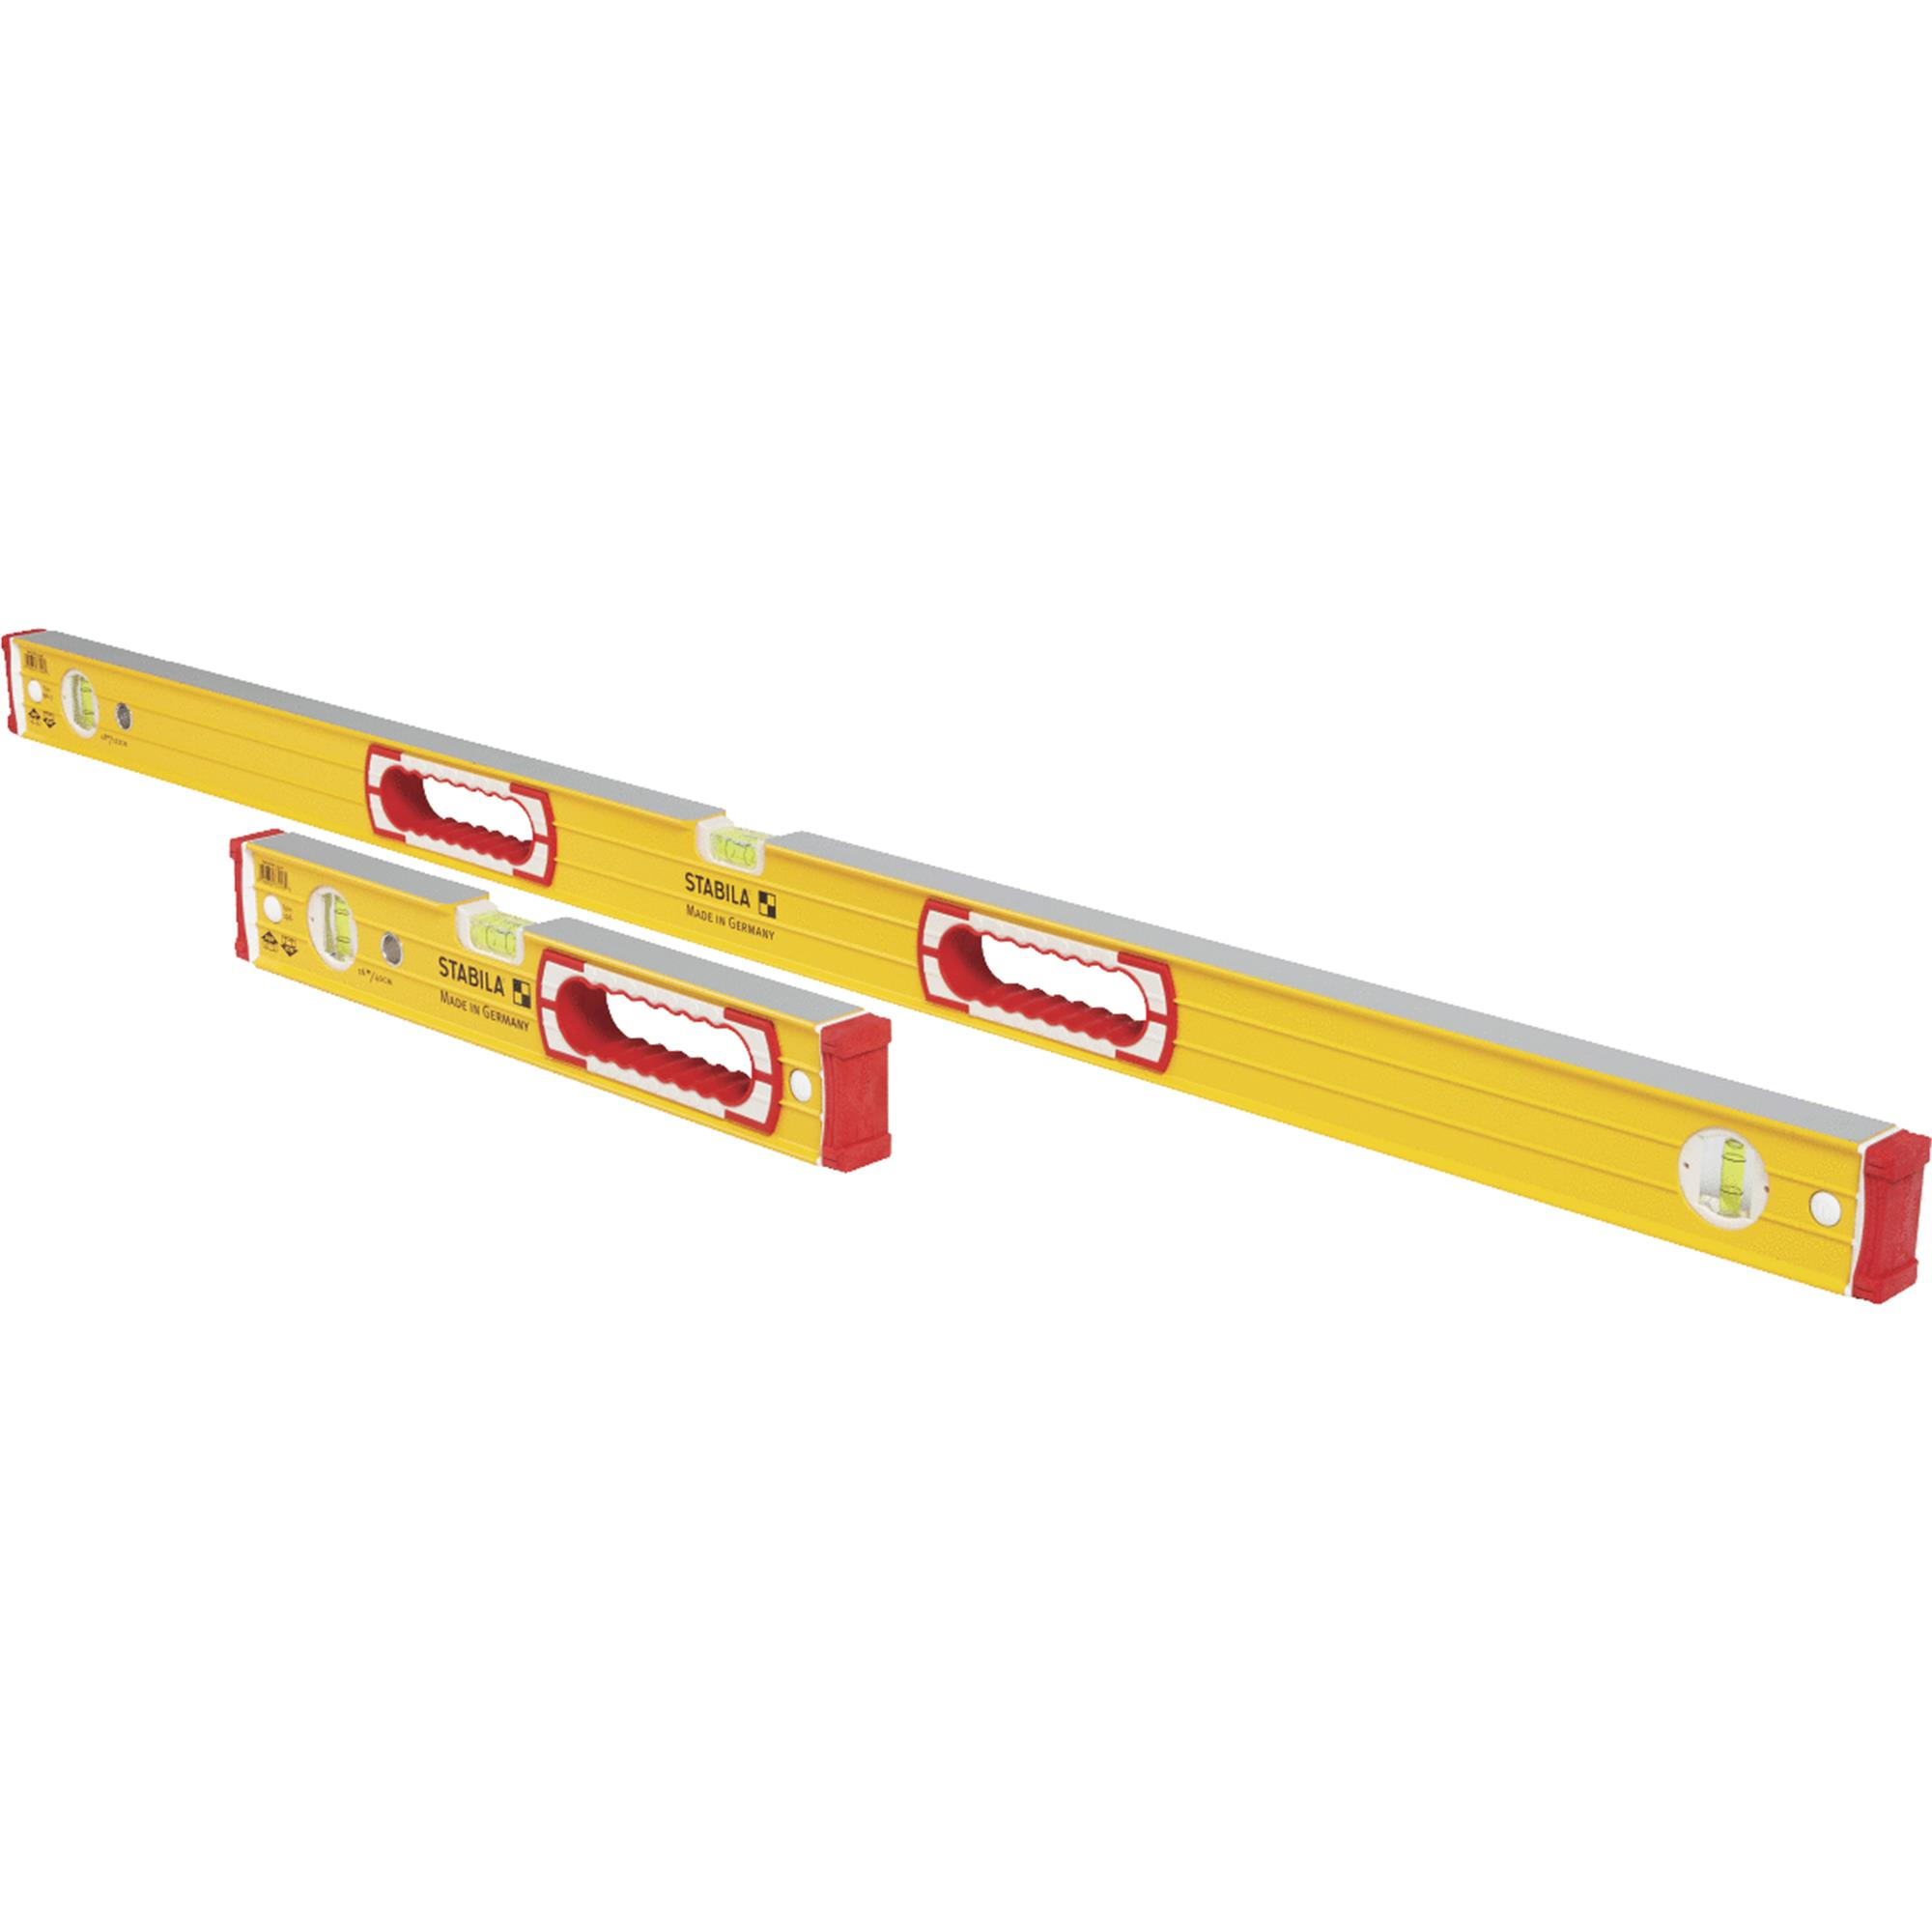 "Stabila 37816 48"" & 16"" Yellow Magnetic Level Set by Stabila"